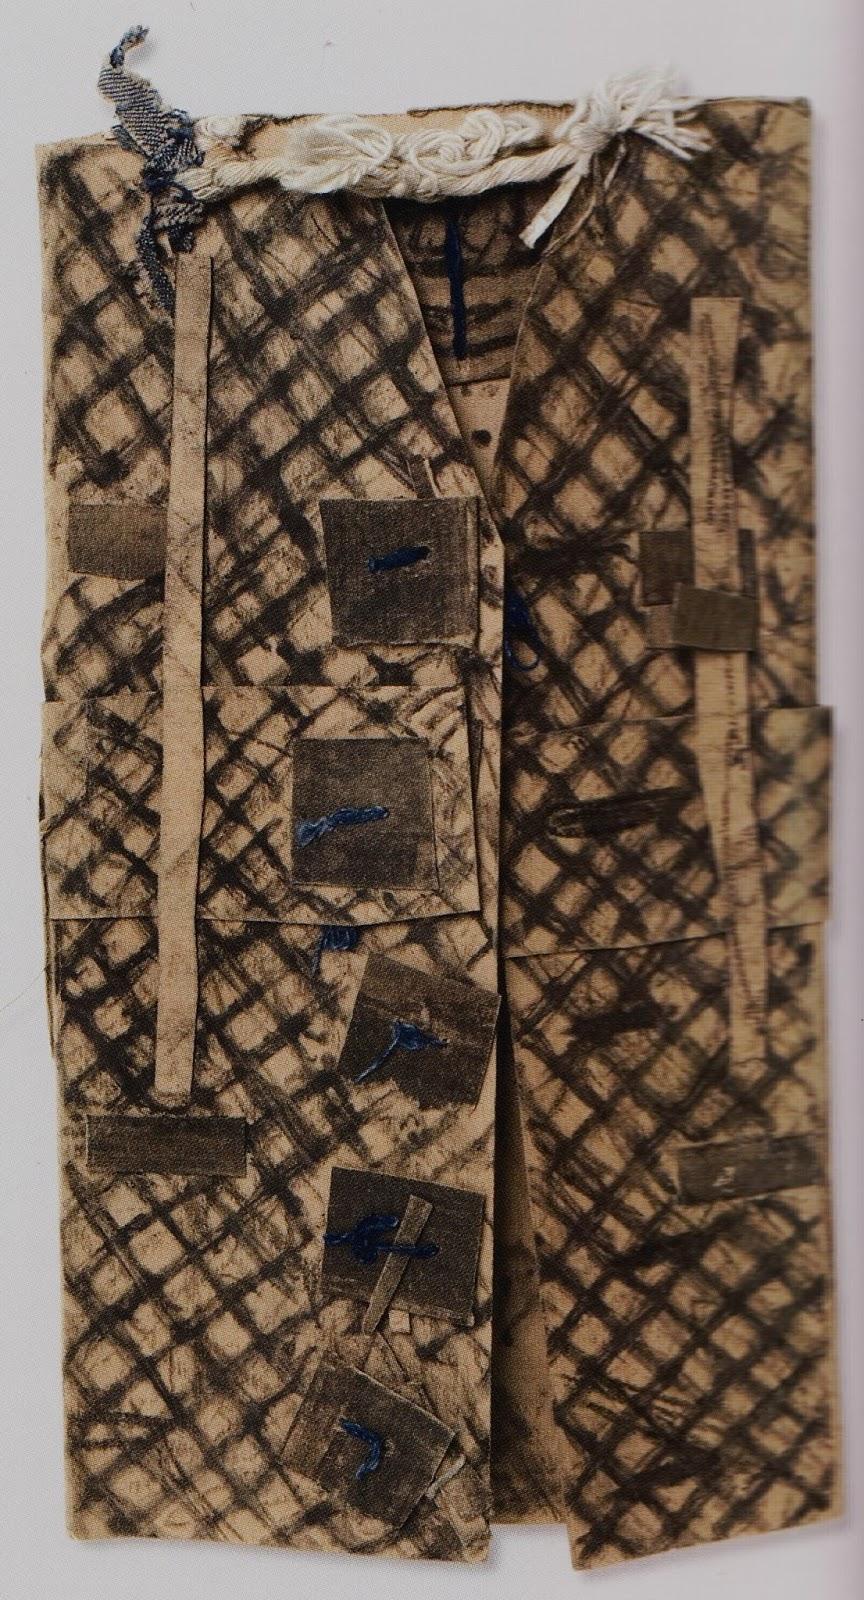 Spencer Alley: Cardboard Clothing